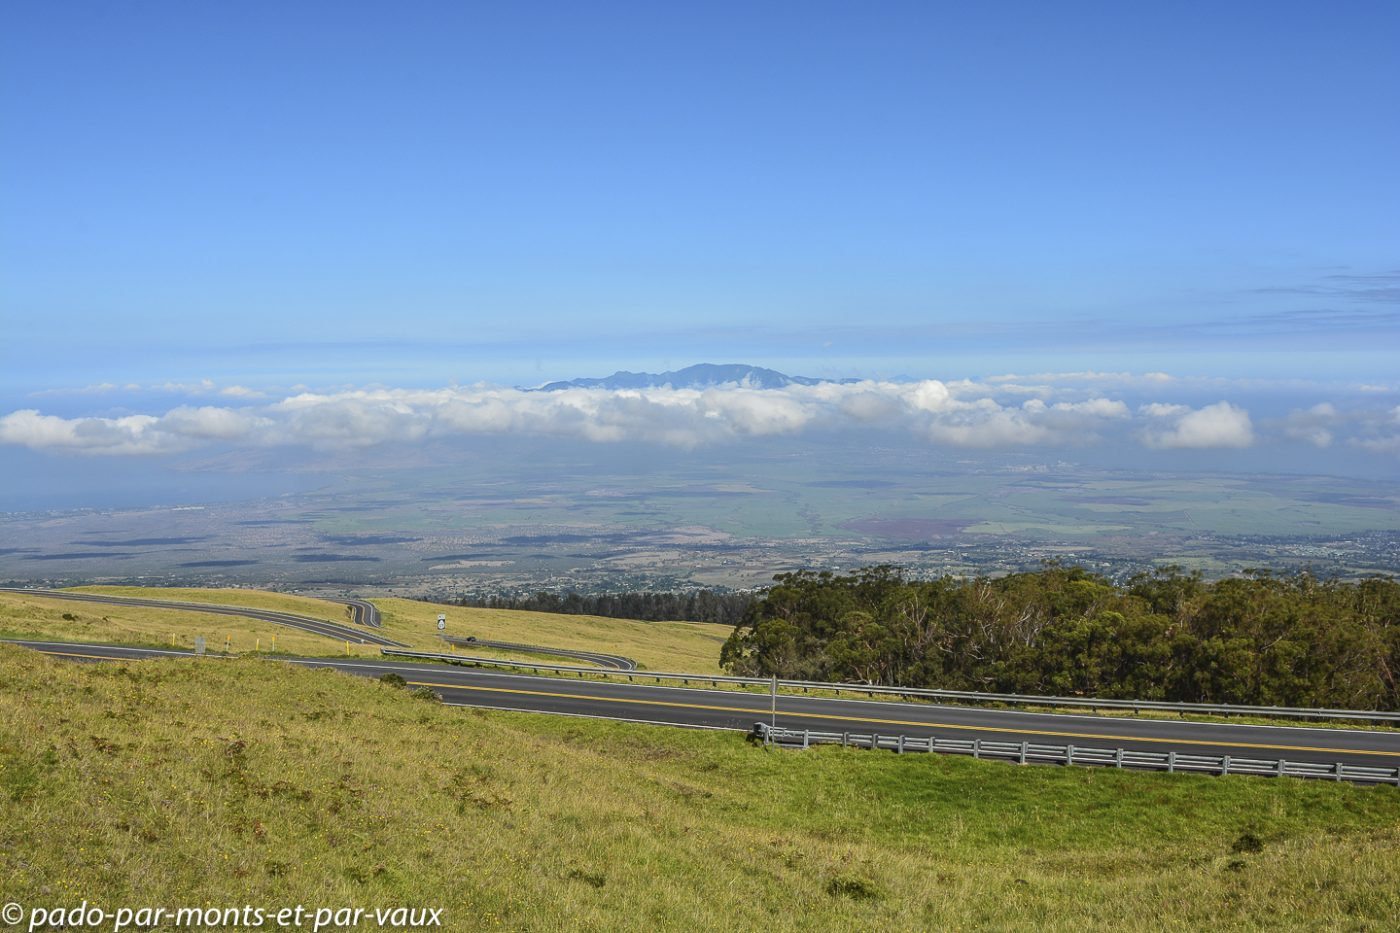 Maui  - Haleakala crater road